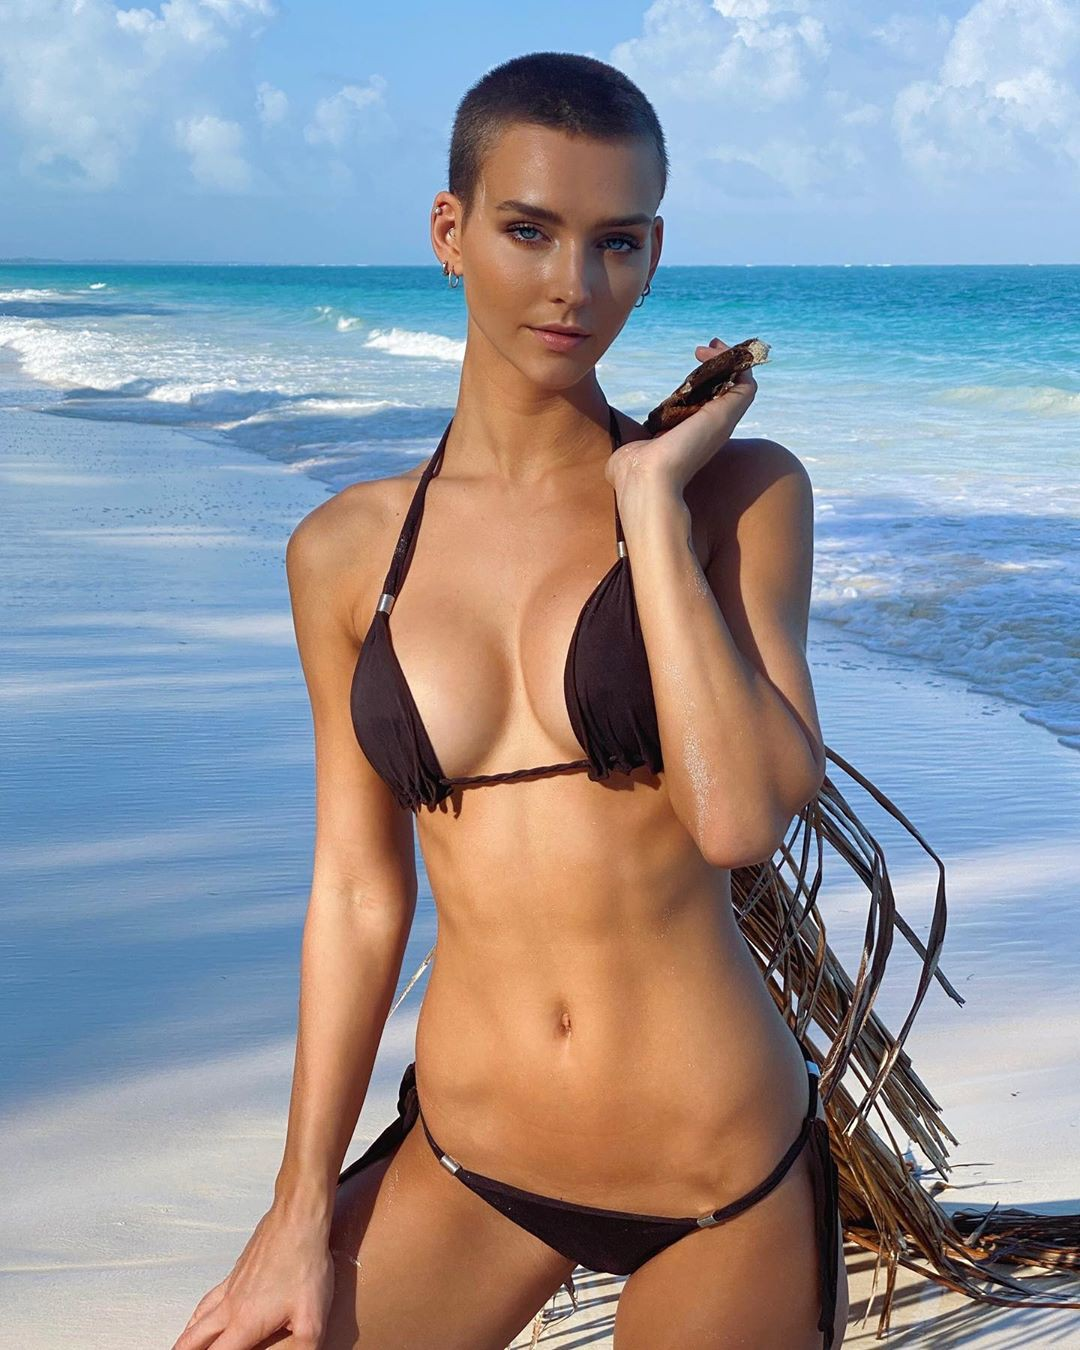 Rachel Cook lingerie, bikini swimsuit top, swimwear matching ideas for girls